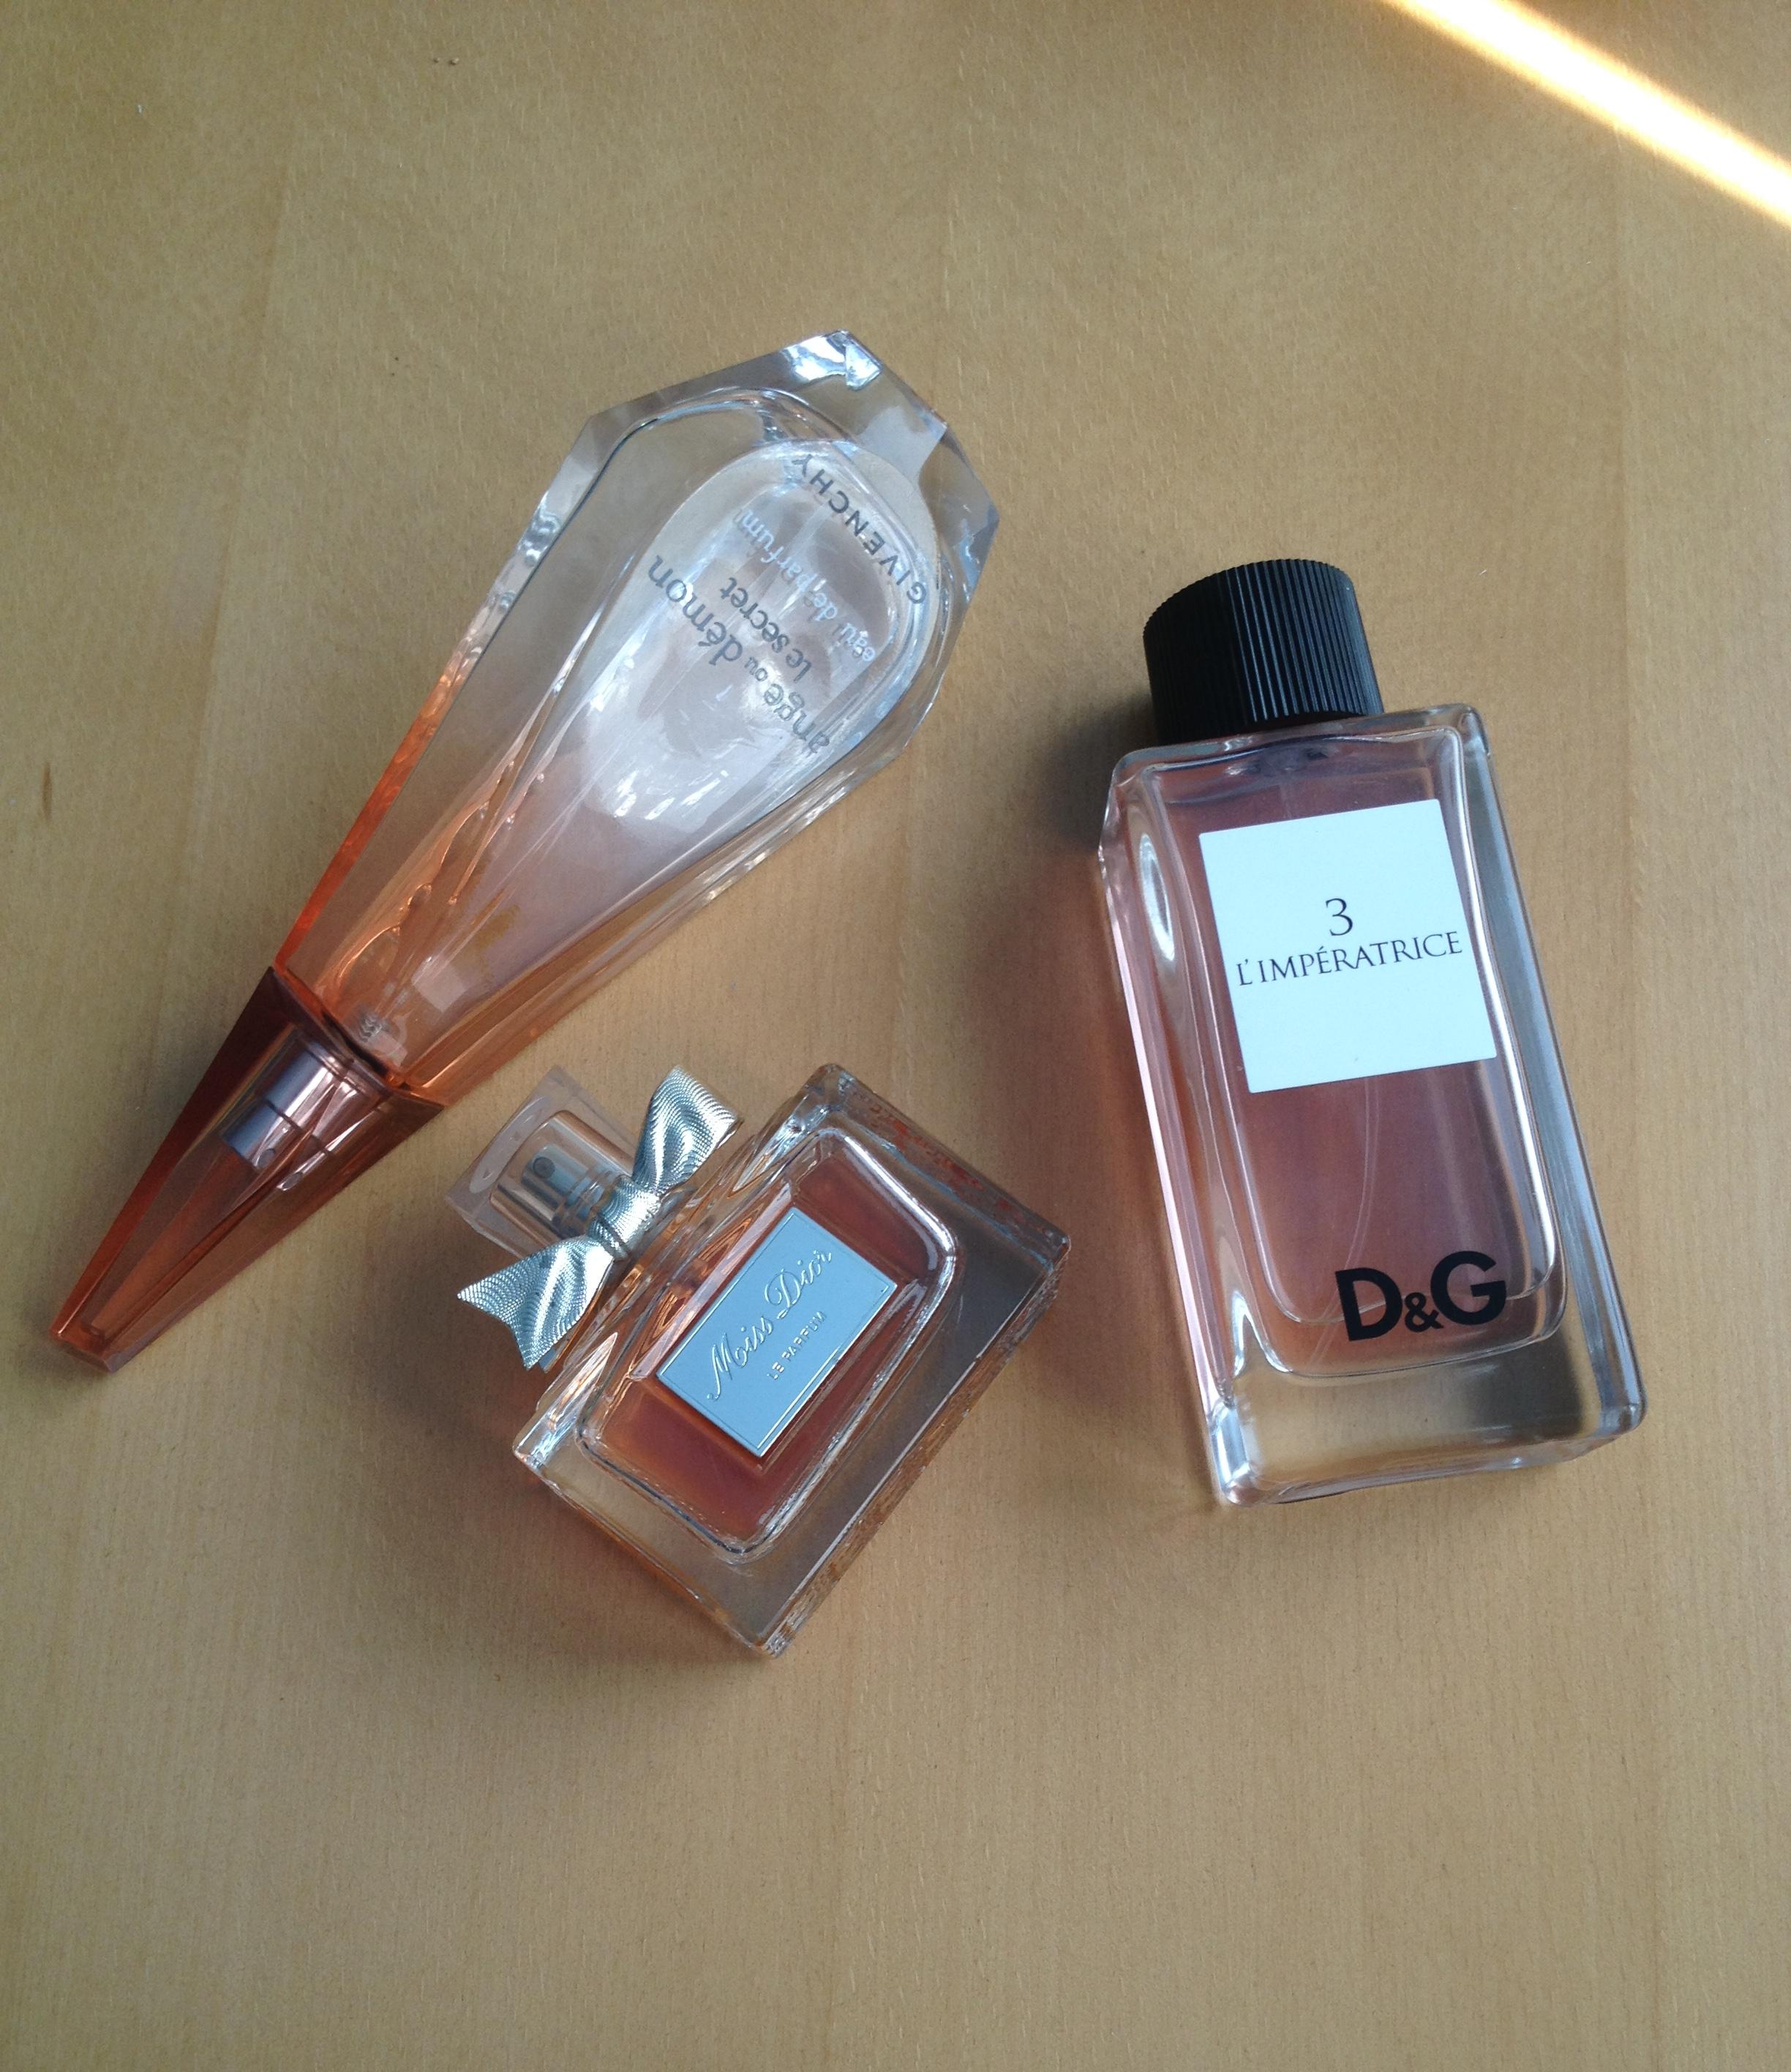 givenchy-dg-dior